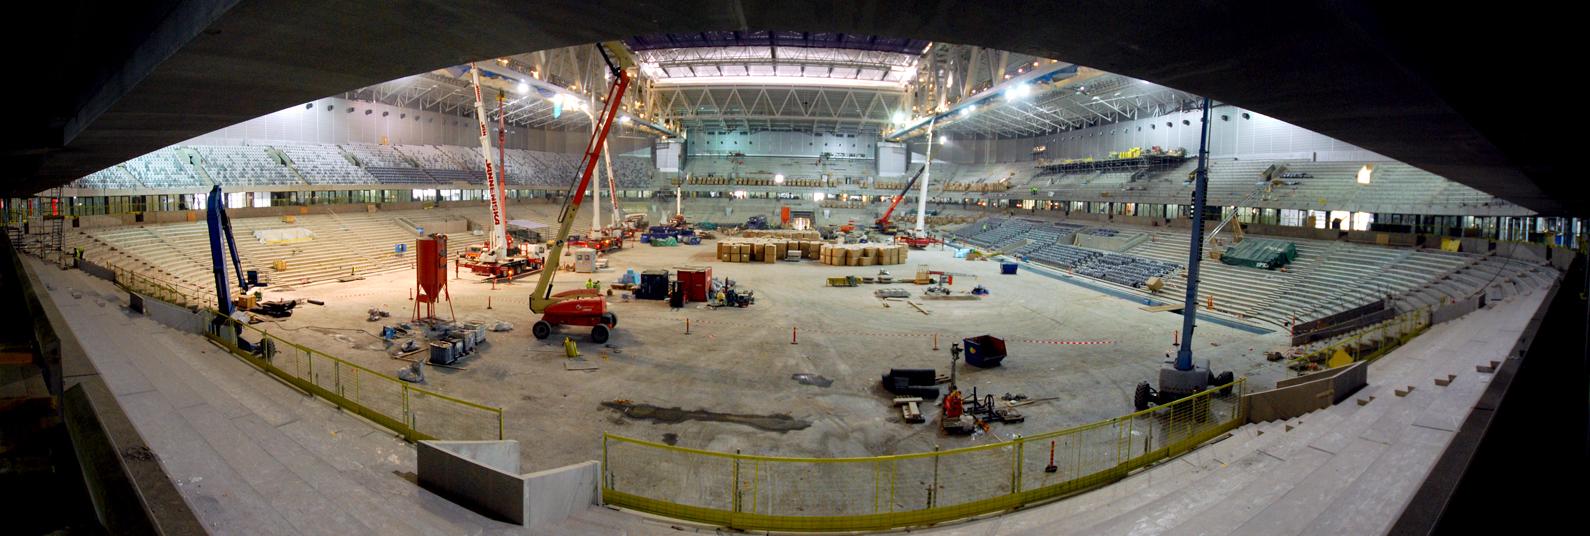 Panorama arenarummet fr s